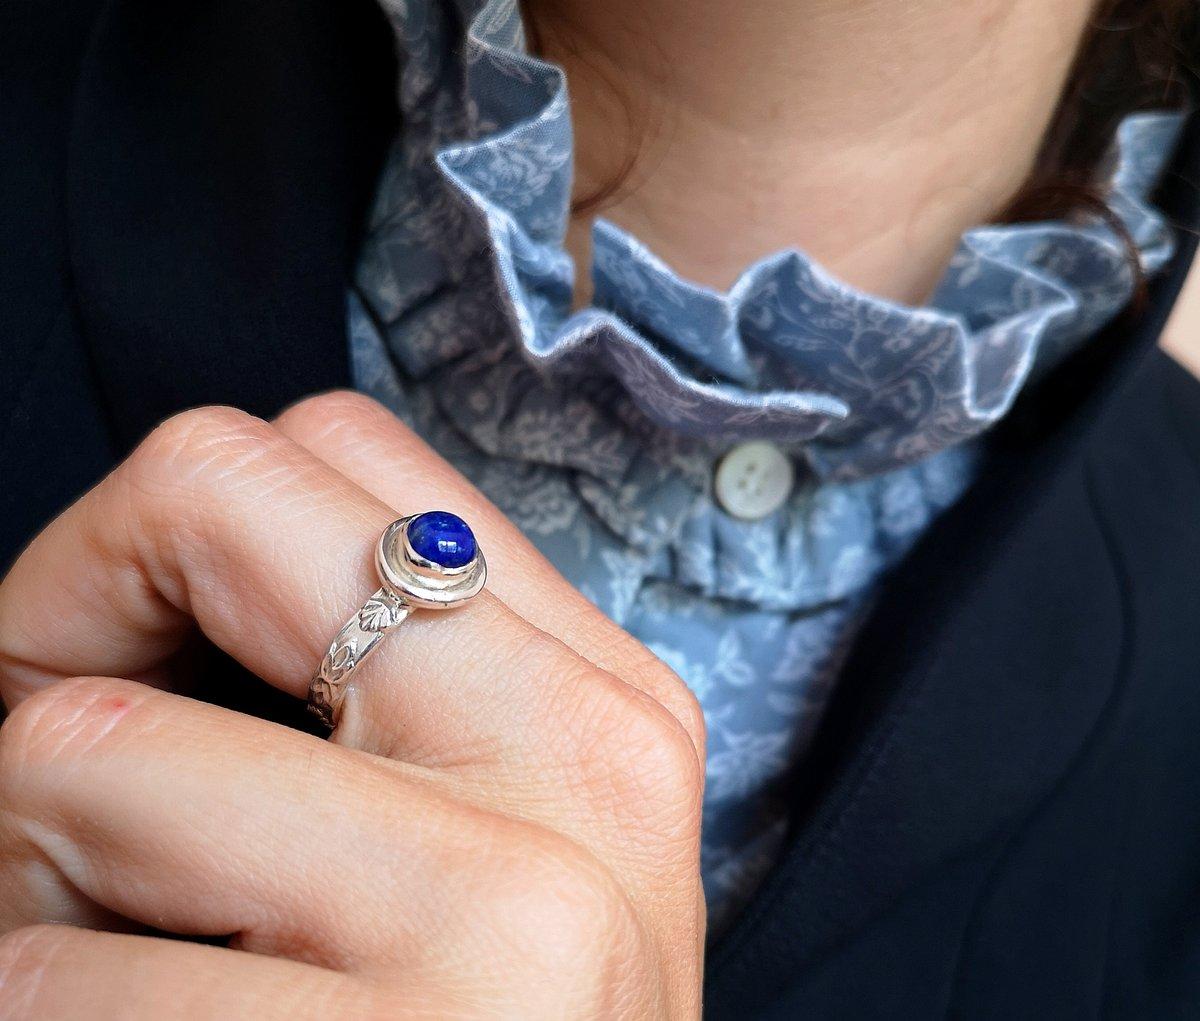 Image of Bague Lapis Lazuli - taille 55,5 - Ref. #5441.